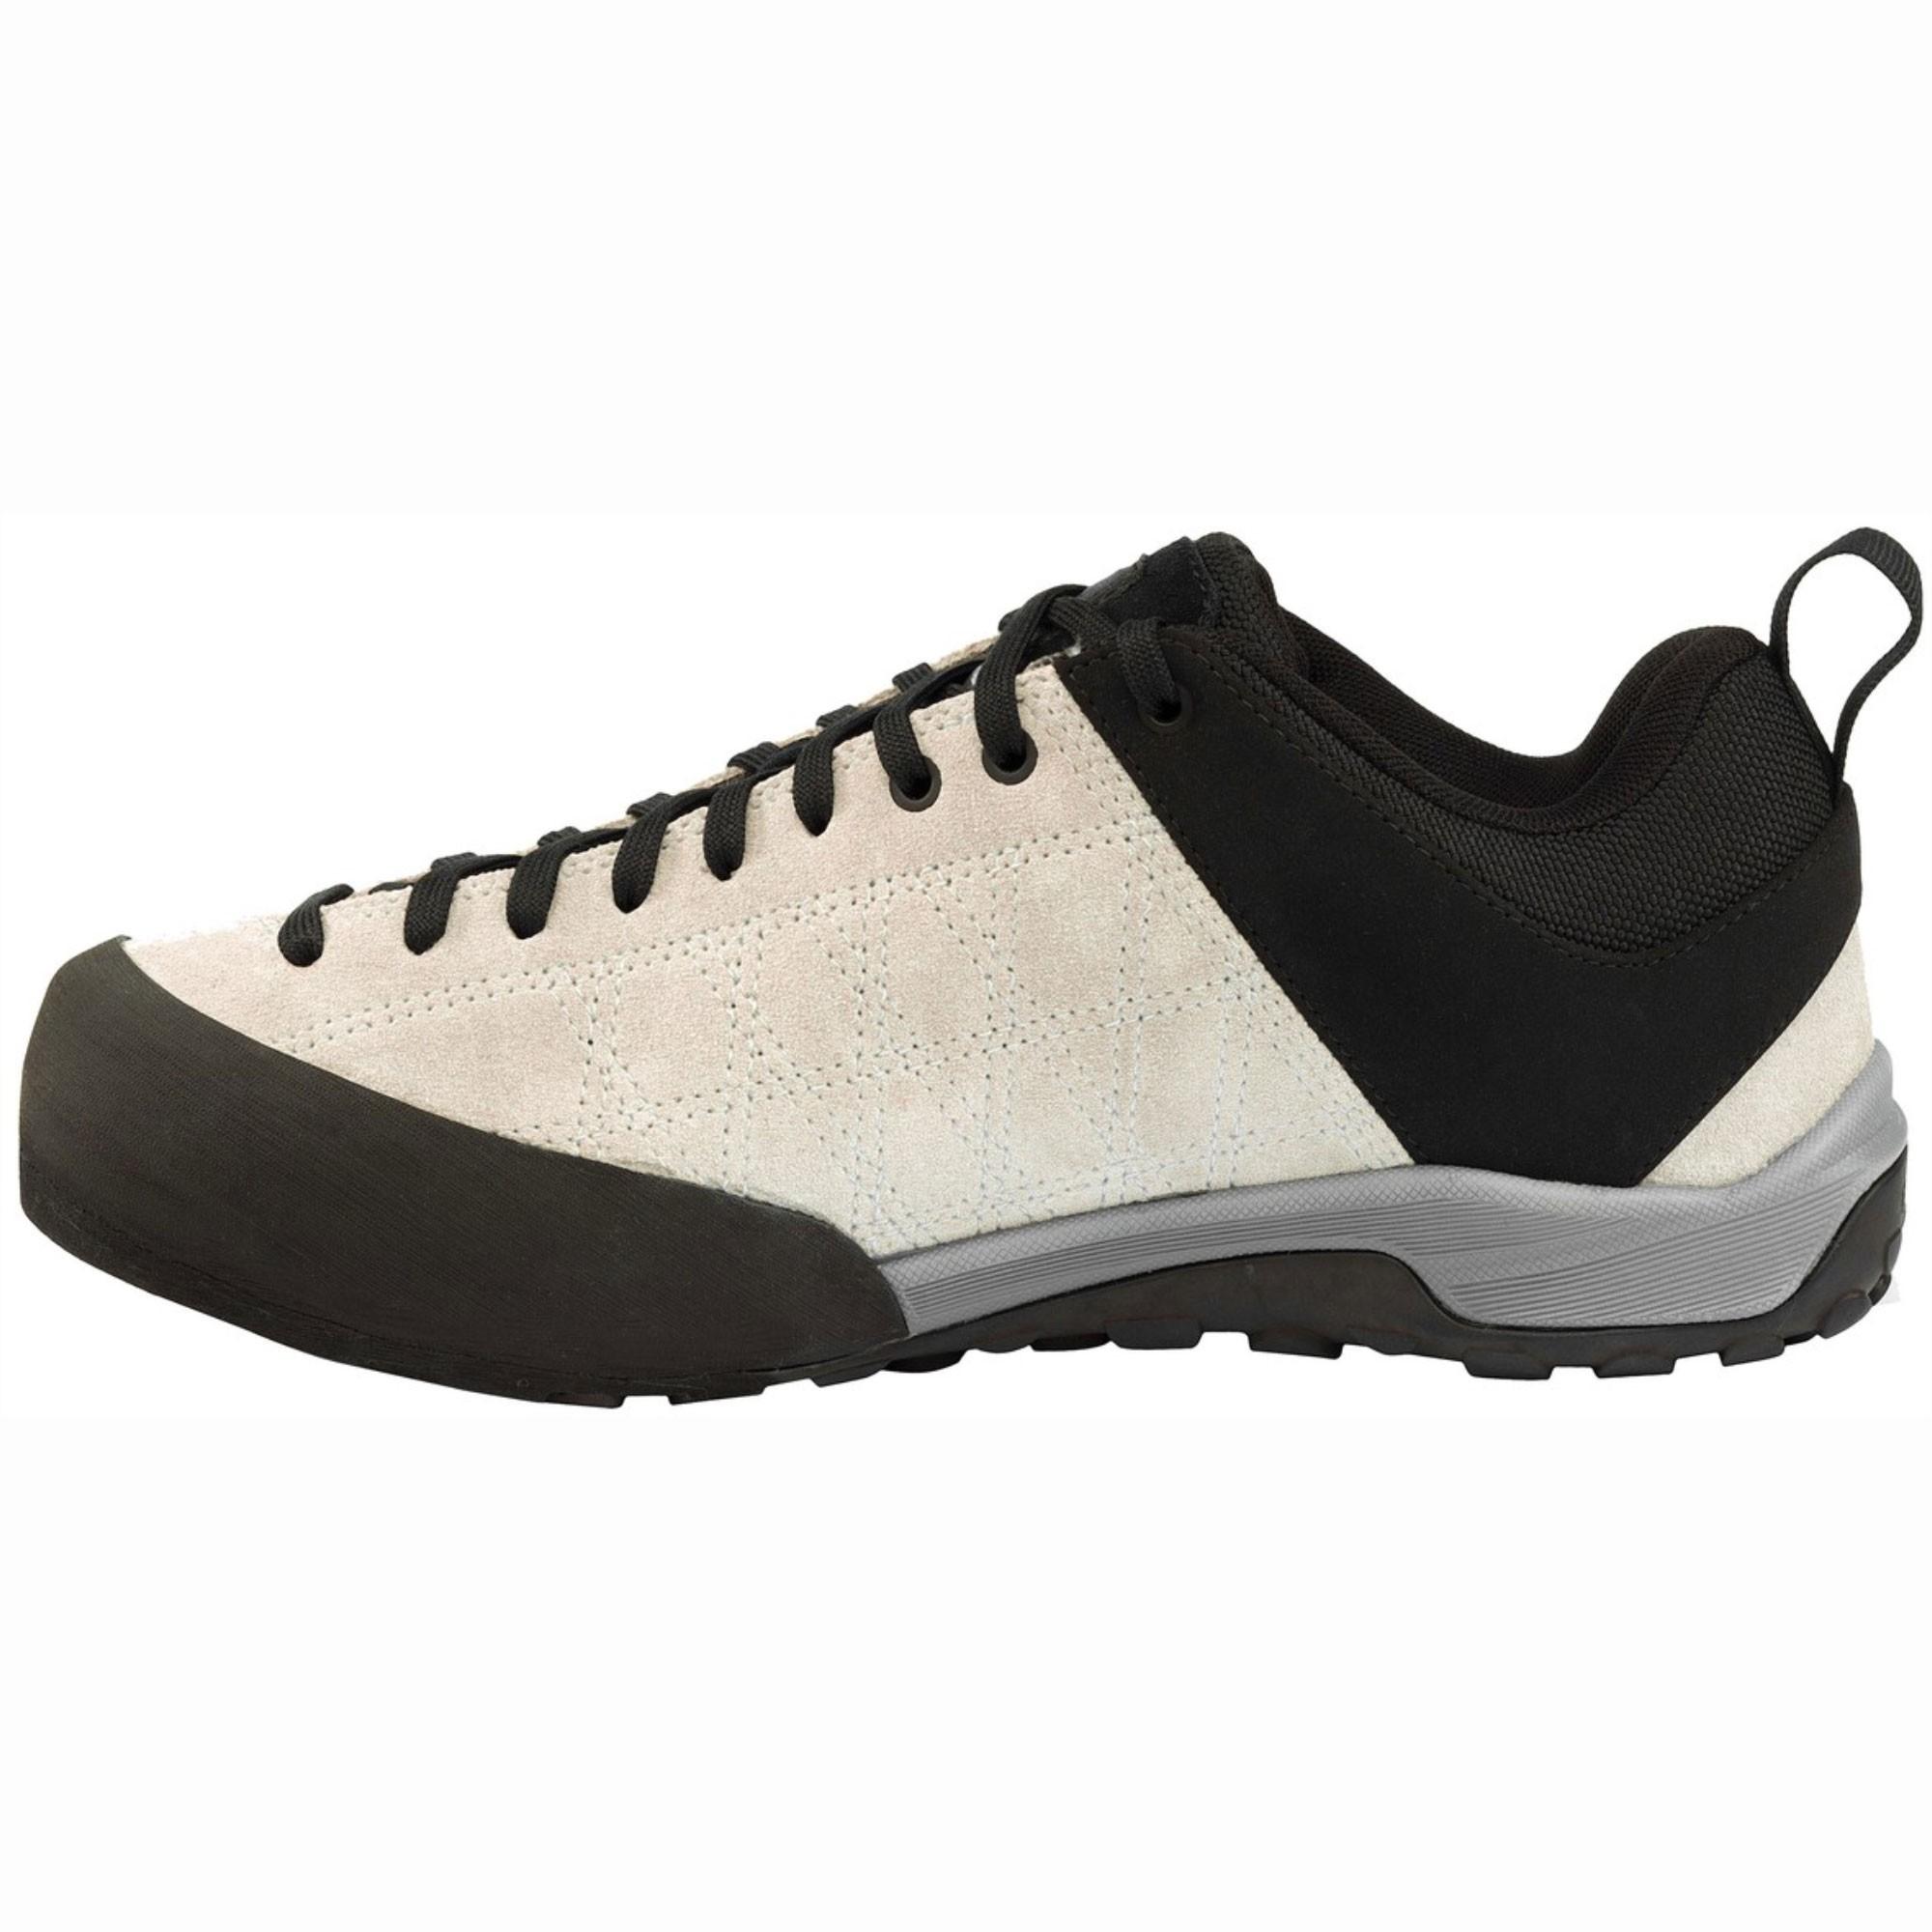 Five Ten Guide Tennie Women's Approach Shoe - Stone Grey